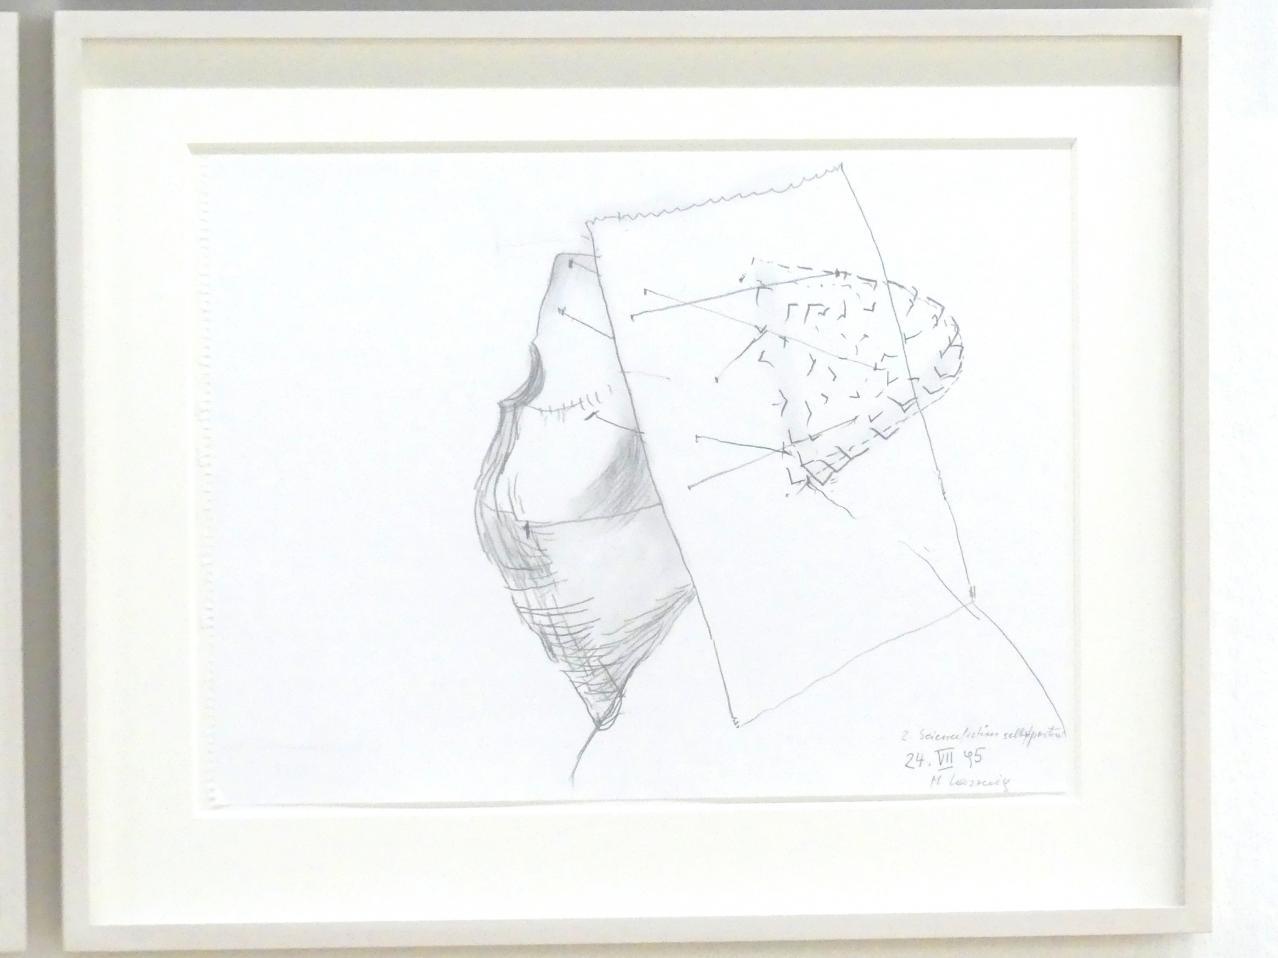 Maria Lassnig: 2. Sciencefictionselbstportrait, 1995